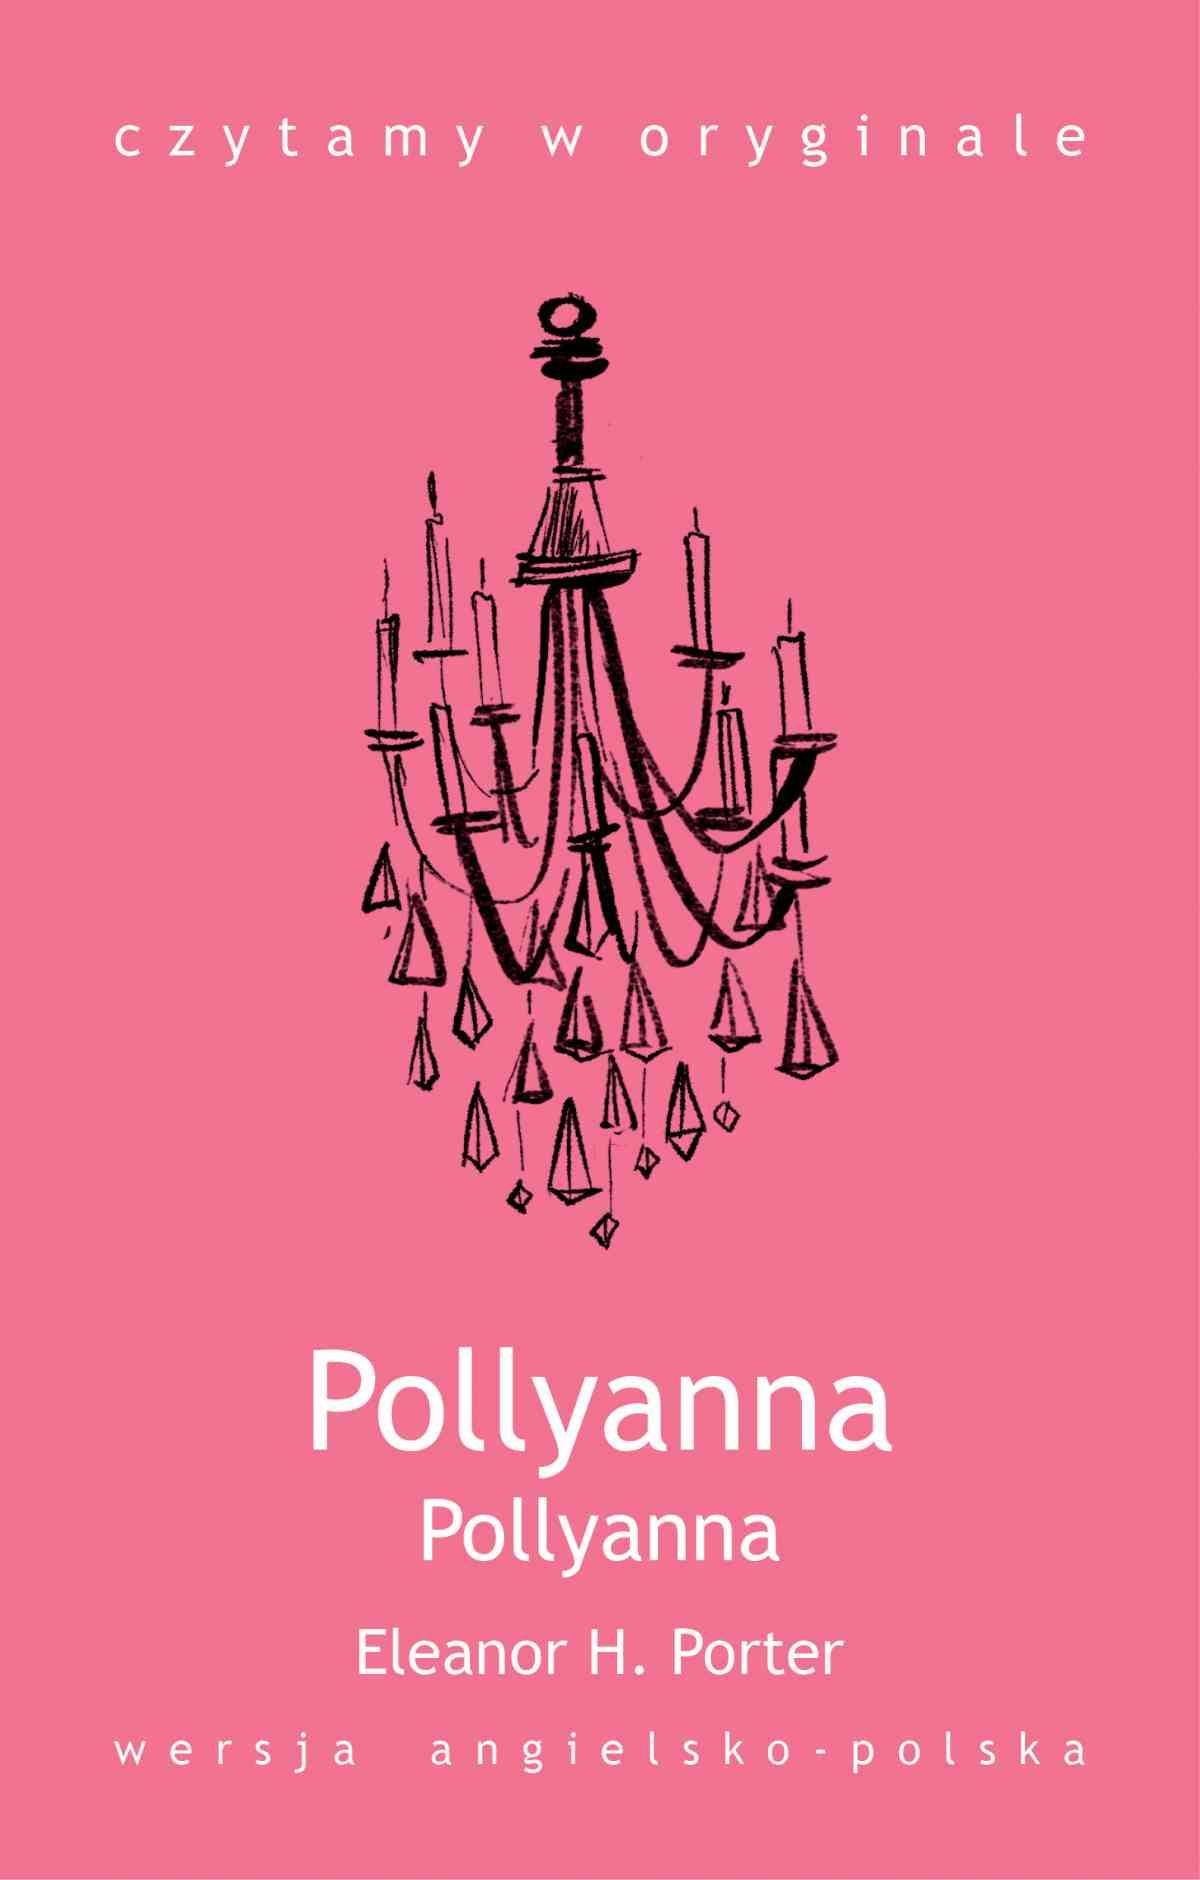 Pollyanna - Ebook (Książka na Kindle) do pobrania w formacie MOBI